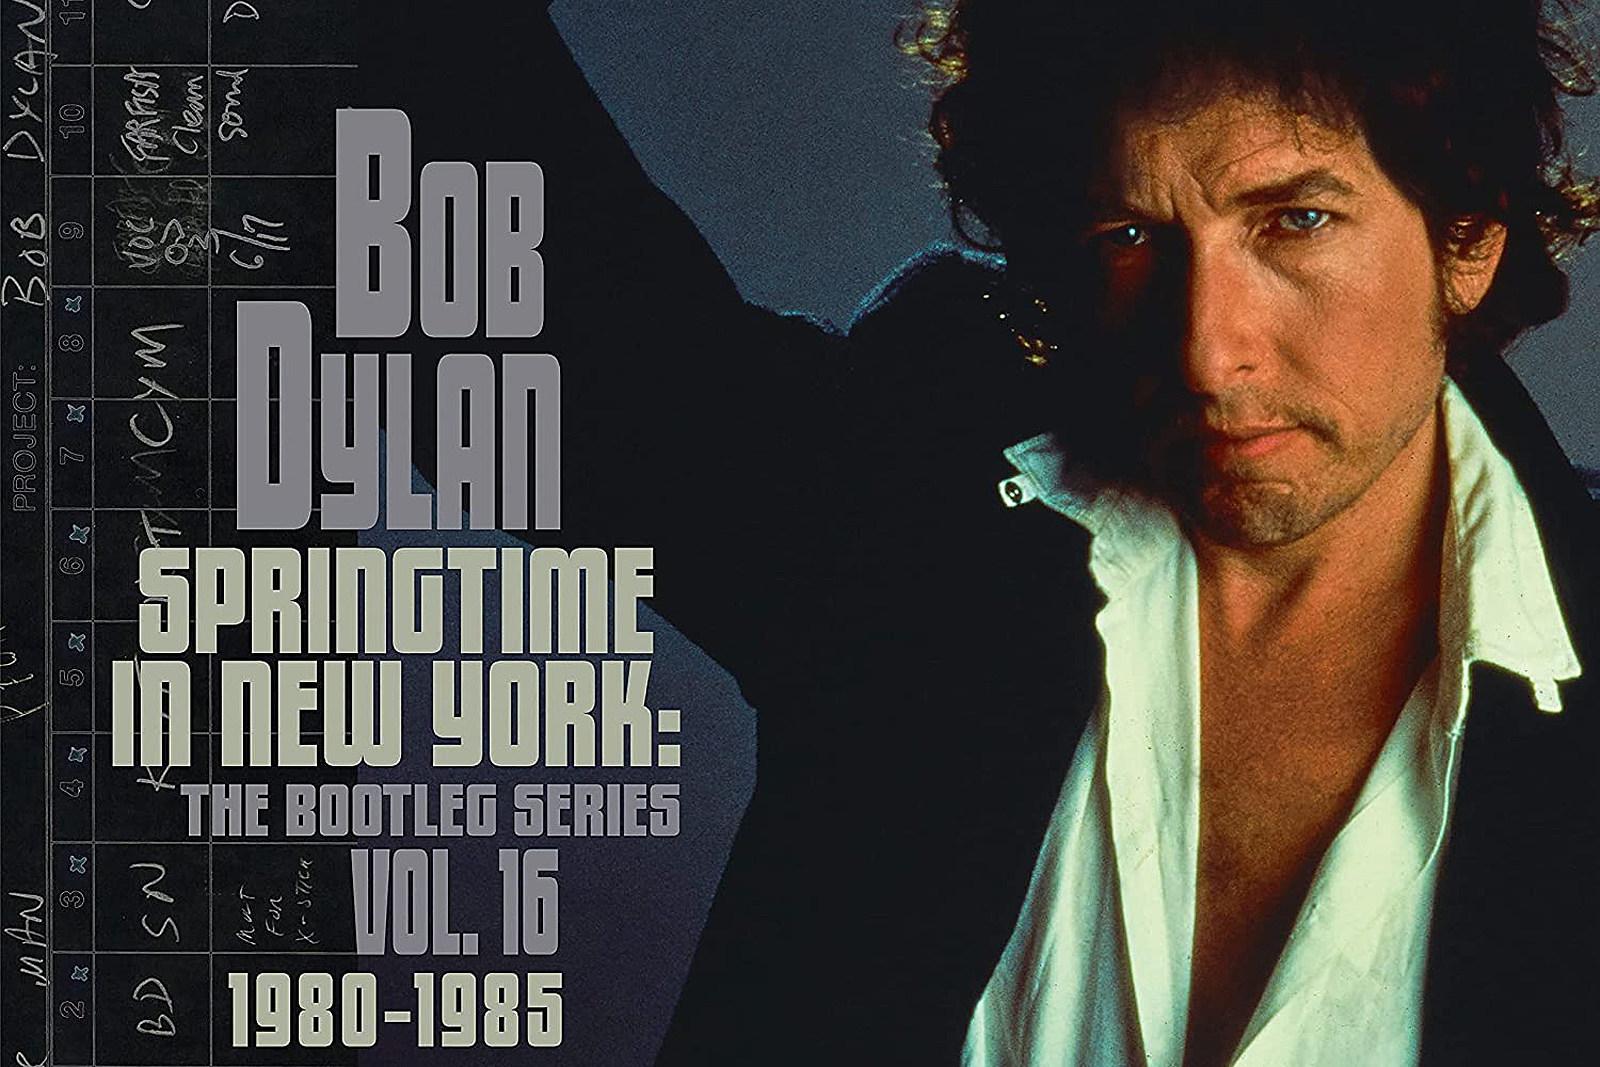 Bob Dylan Announces 'The Bootleg Series Vol. 16'